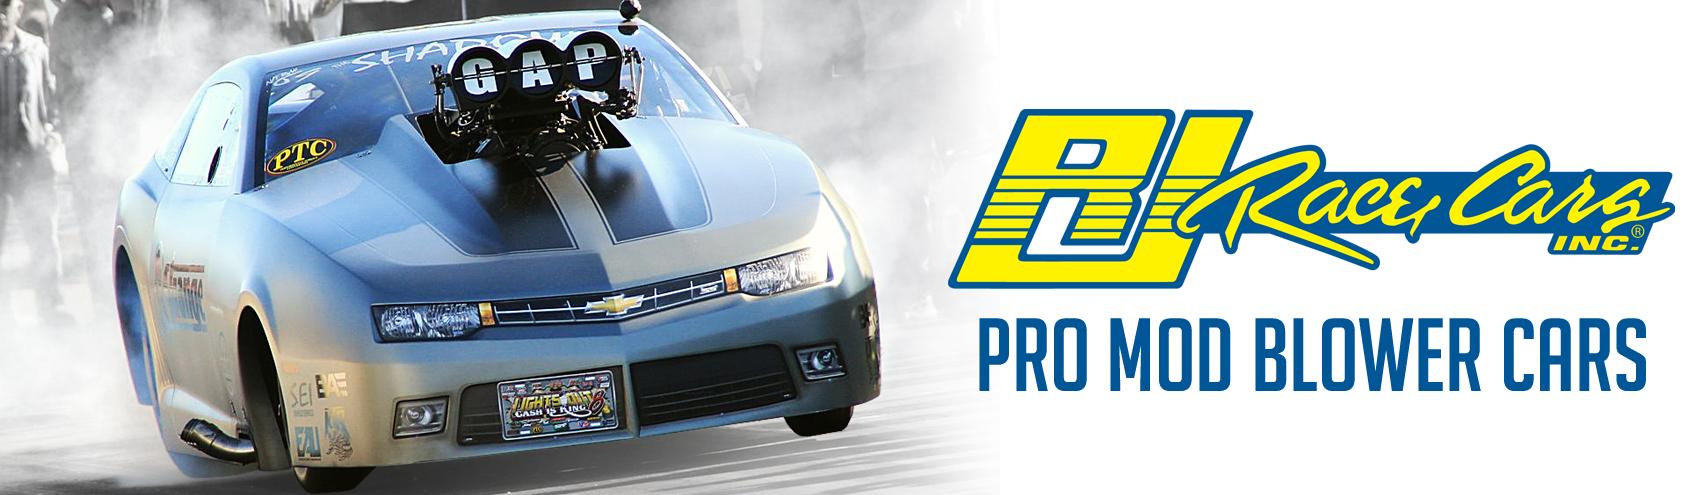 pro-mod-blower-cars-banner.jpg